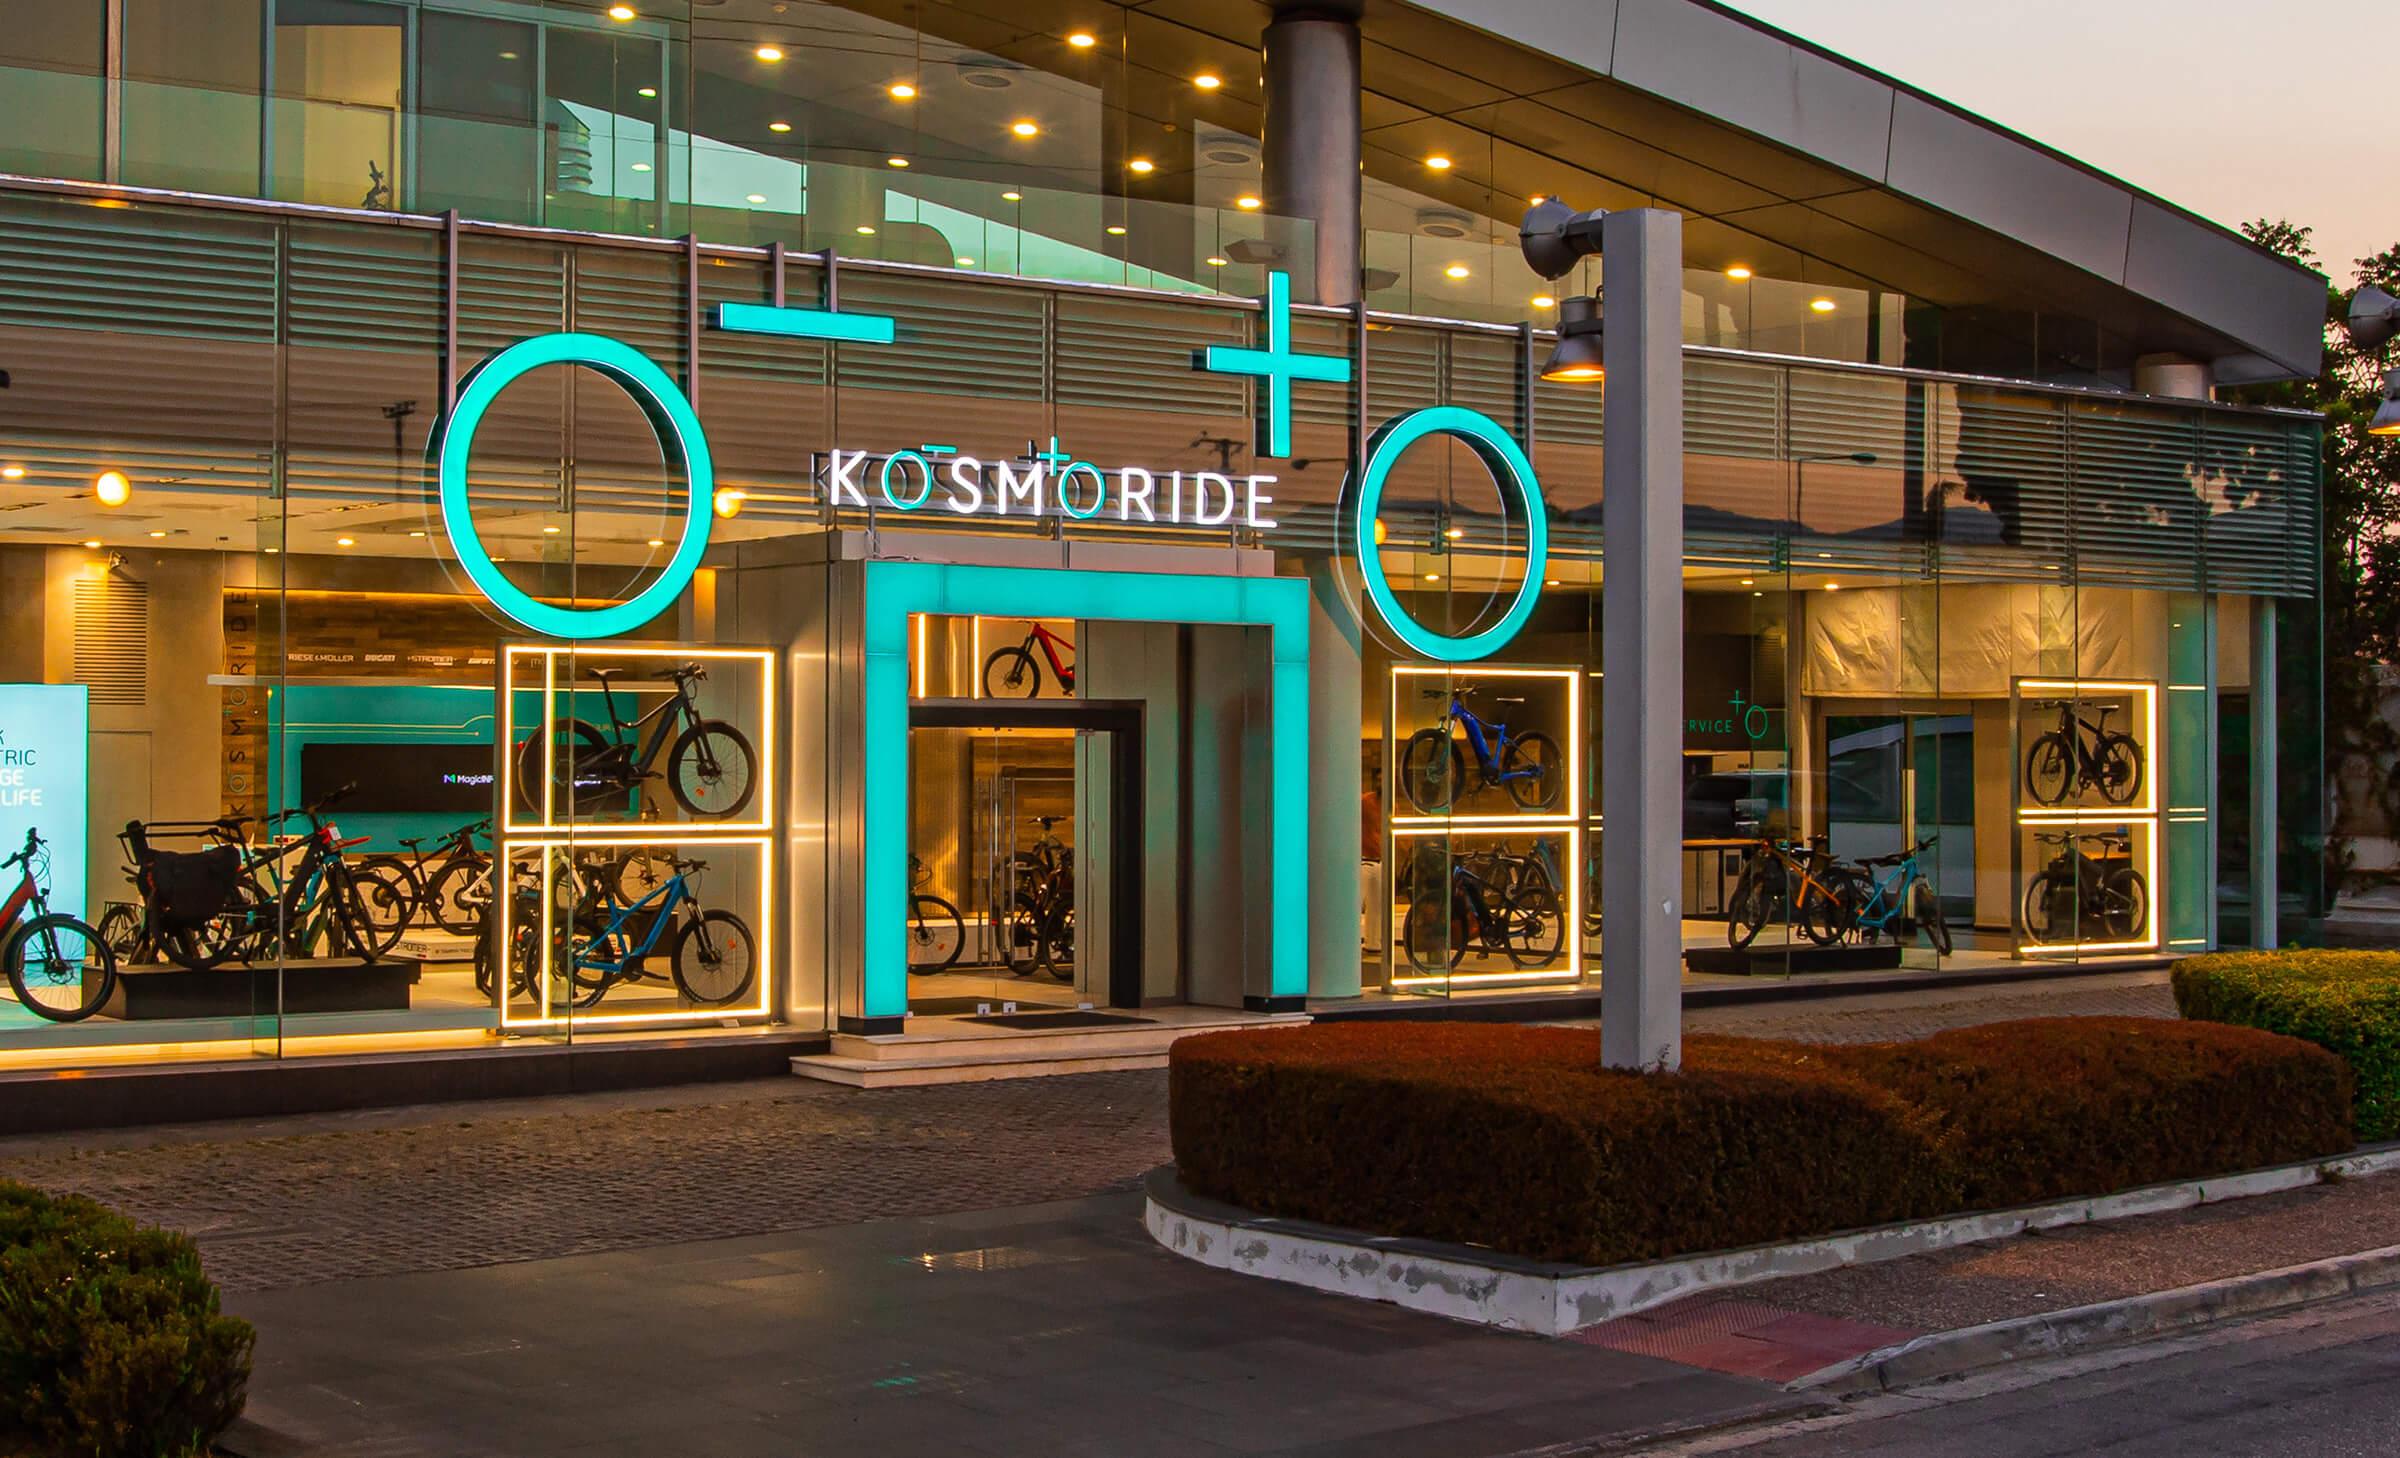 Kosmoride e-Bikes experience store - Κατάστημα ηλεκτρικών ποδηλάτων στο Μαρούσι